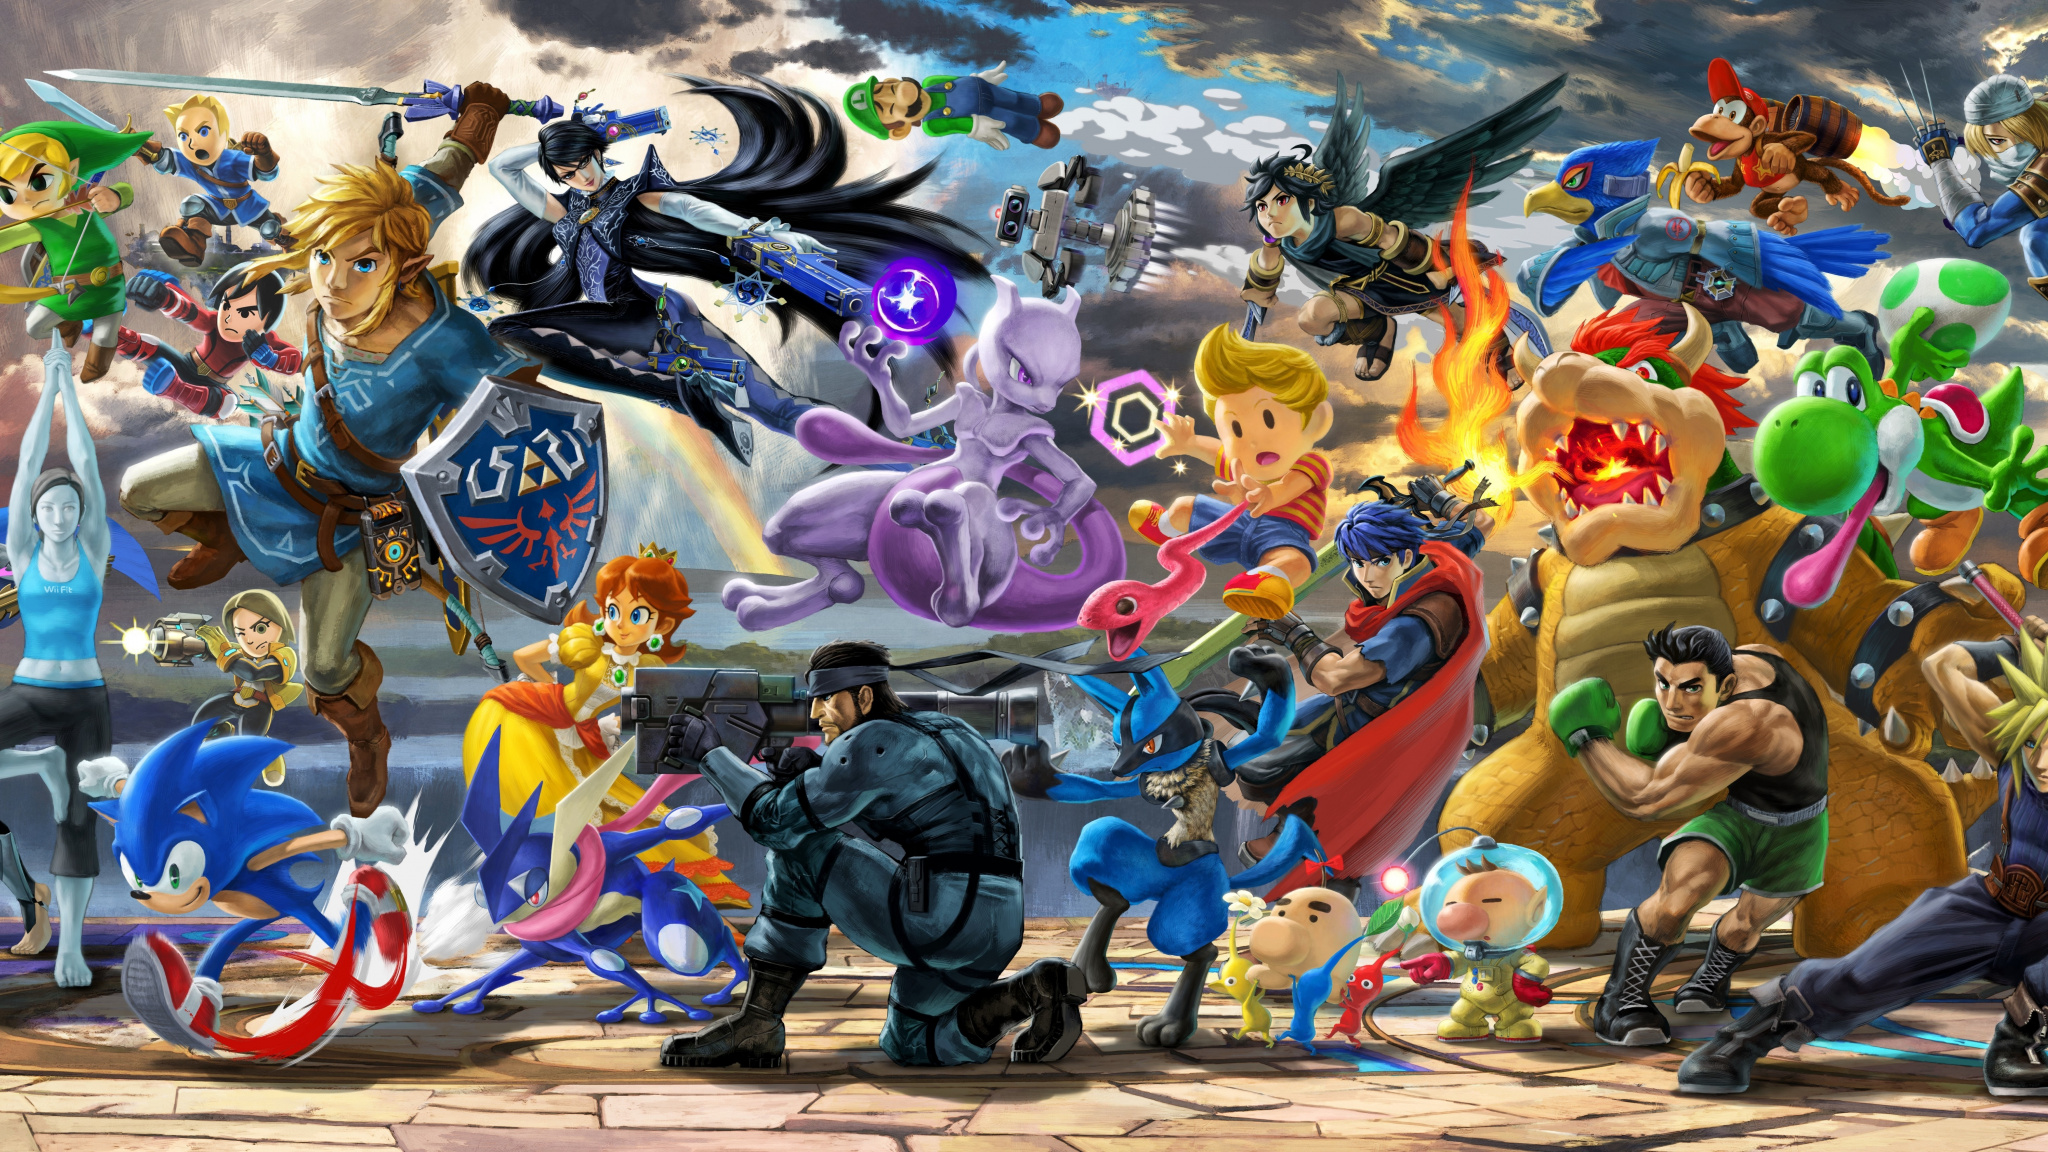 Wallpaper 2018 Nintendo Switch Super Smash Bros Smash Bros